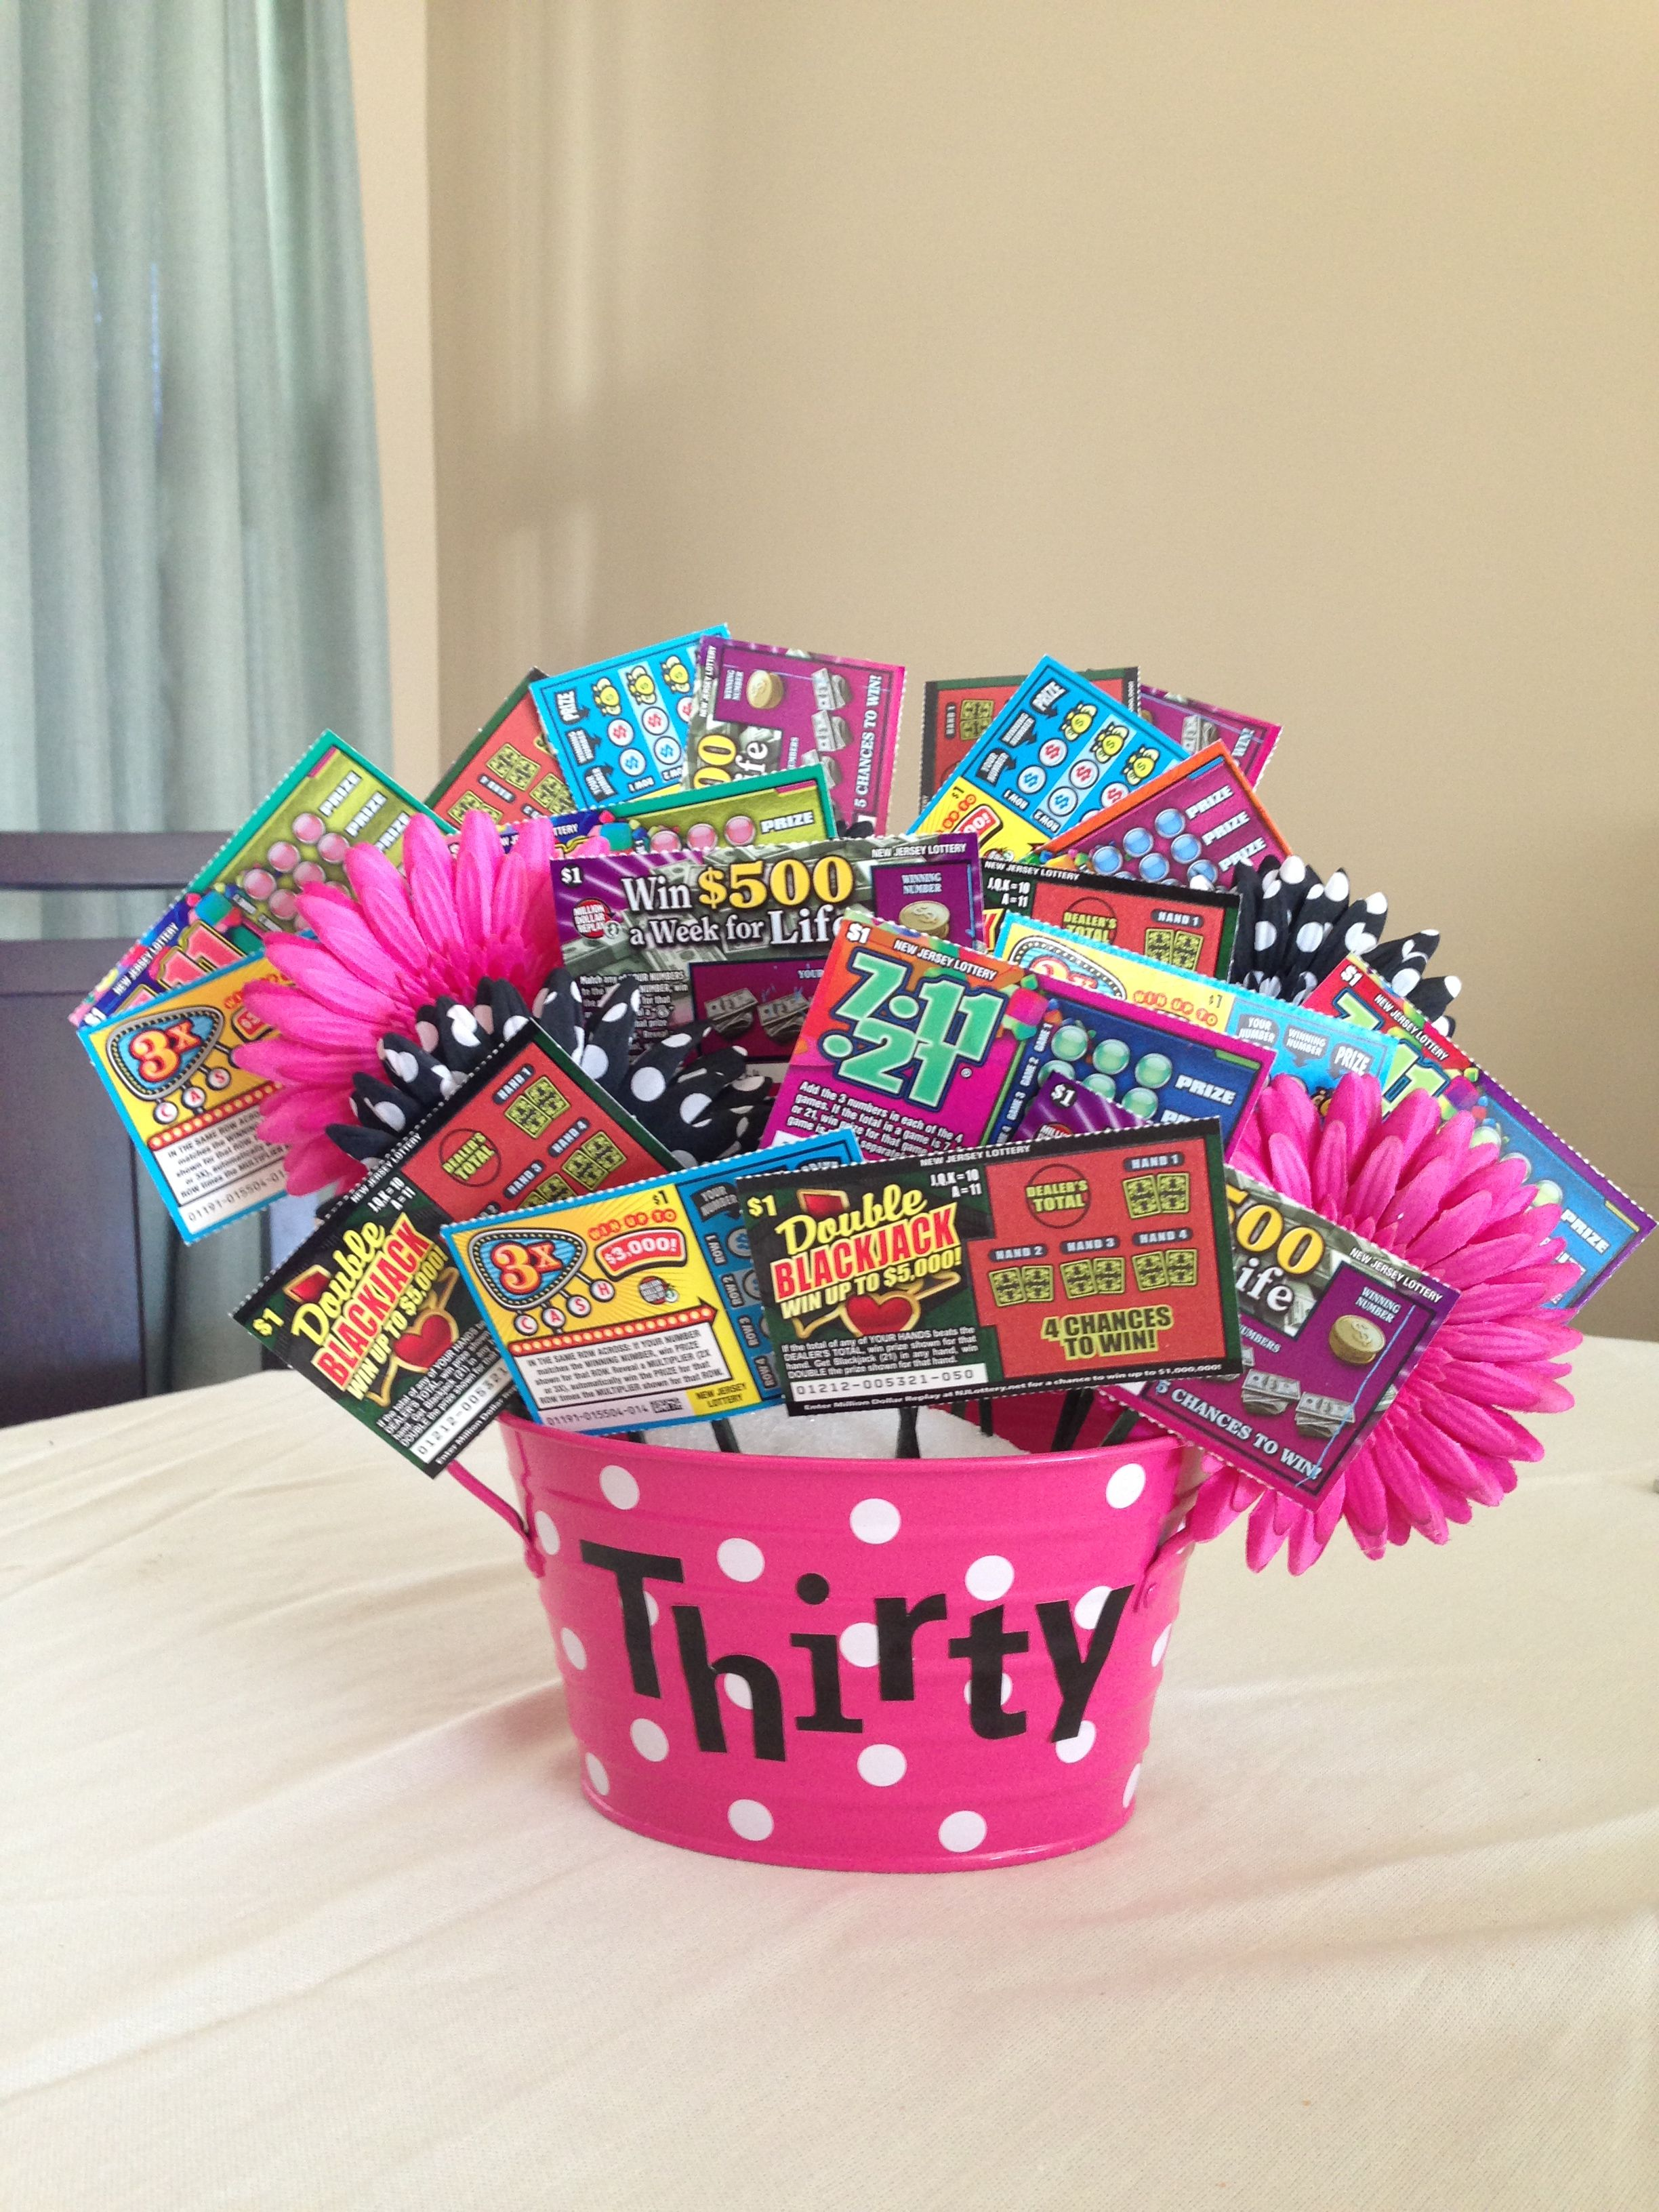 30th birthday gift 30th birthday gifts, Milestone